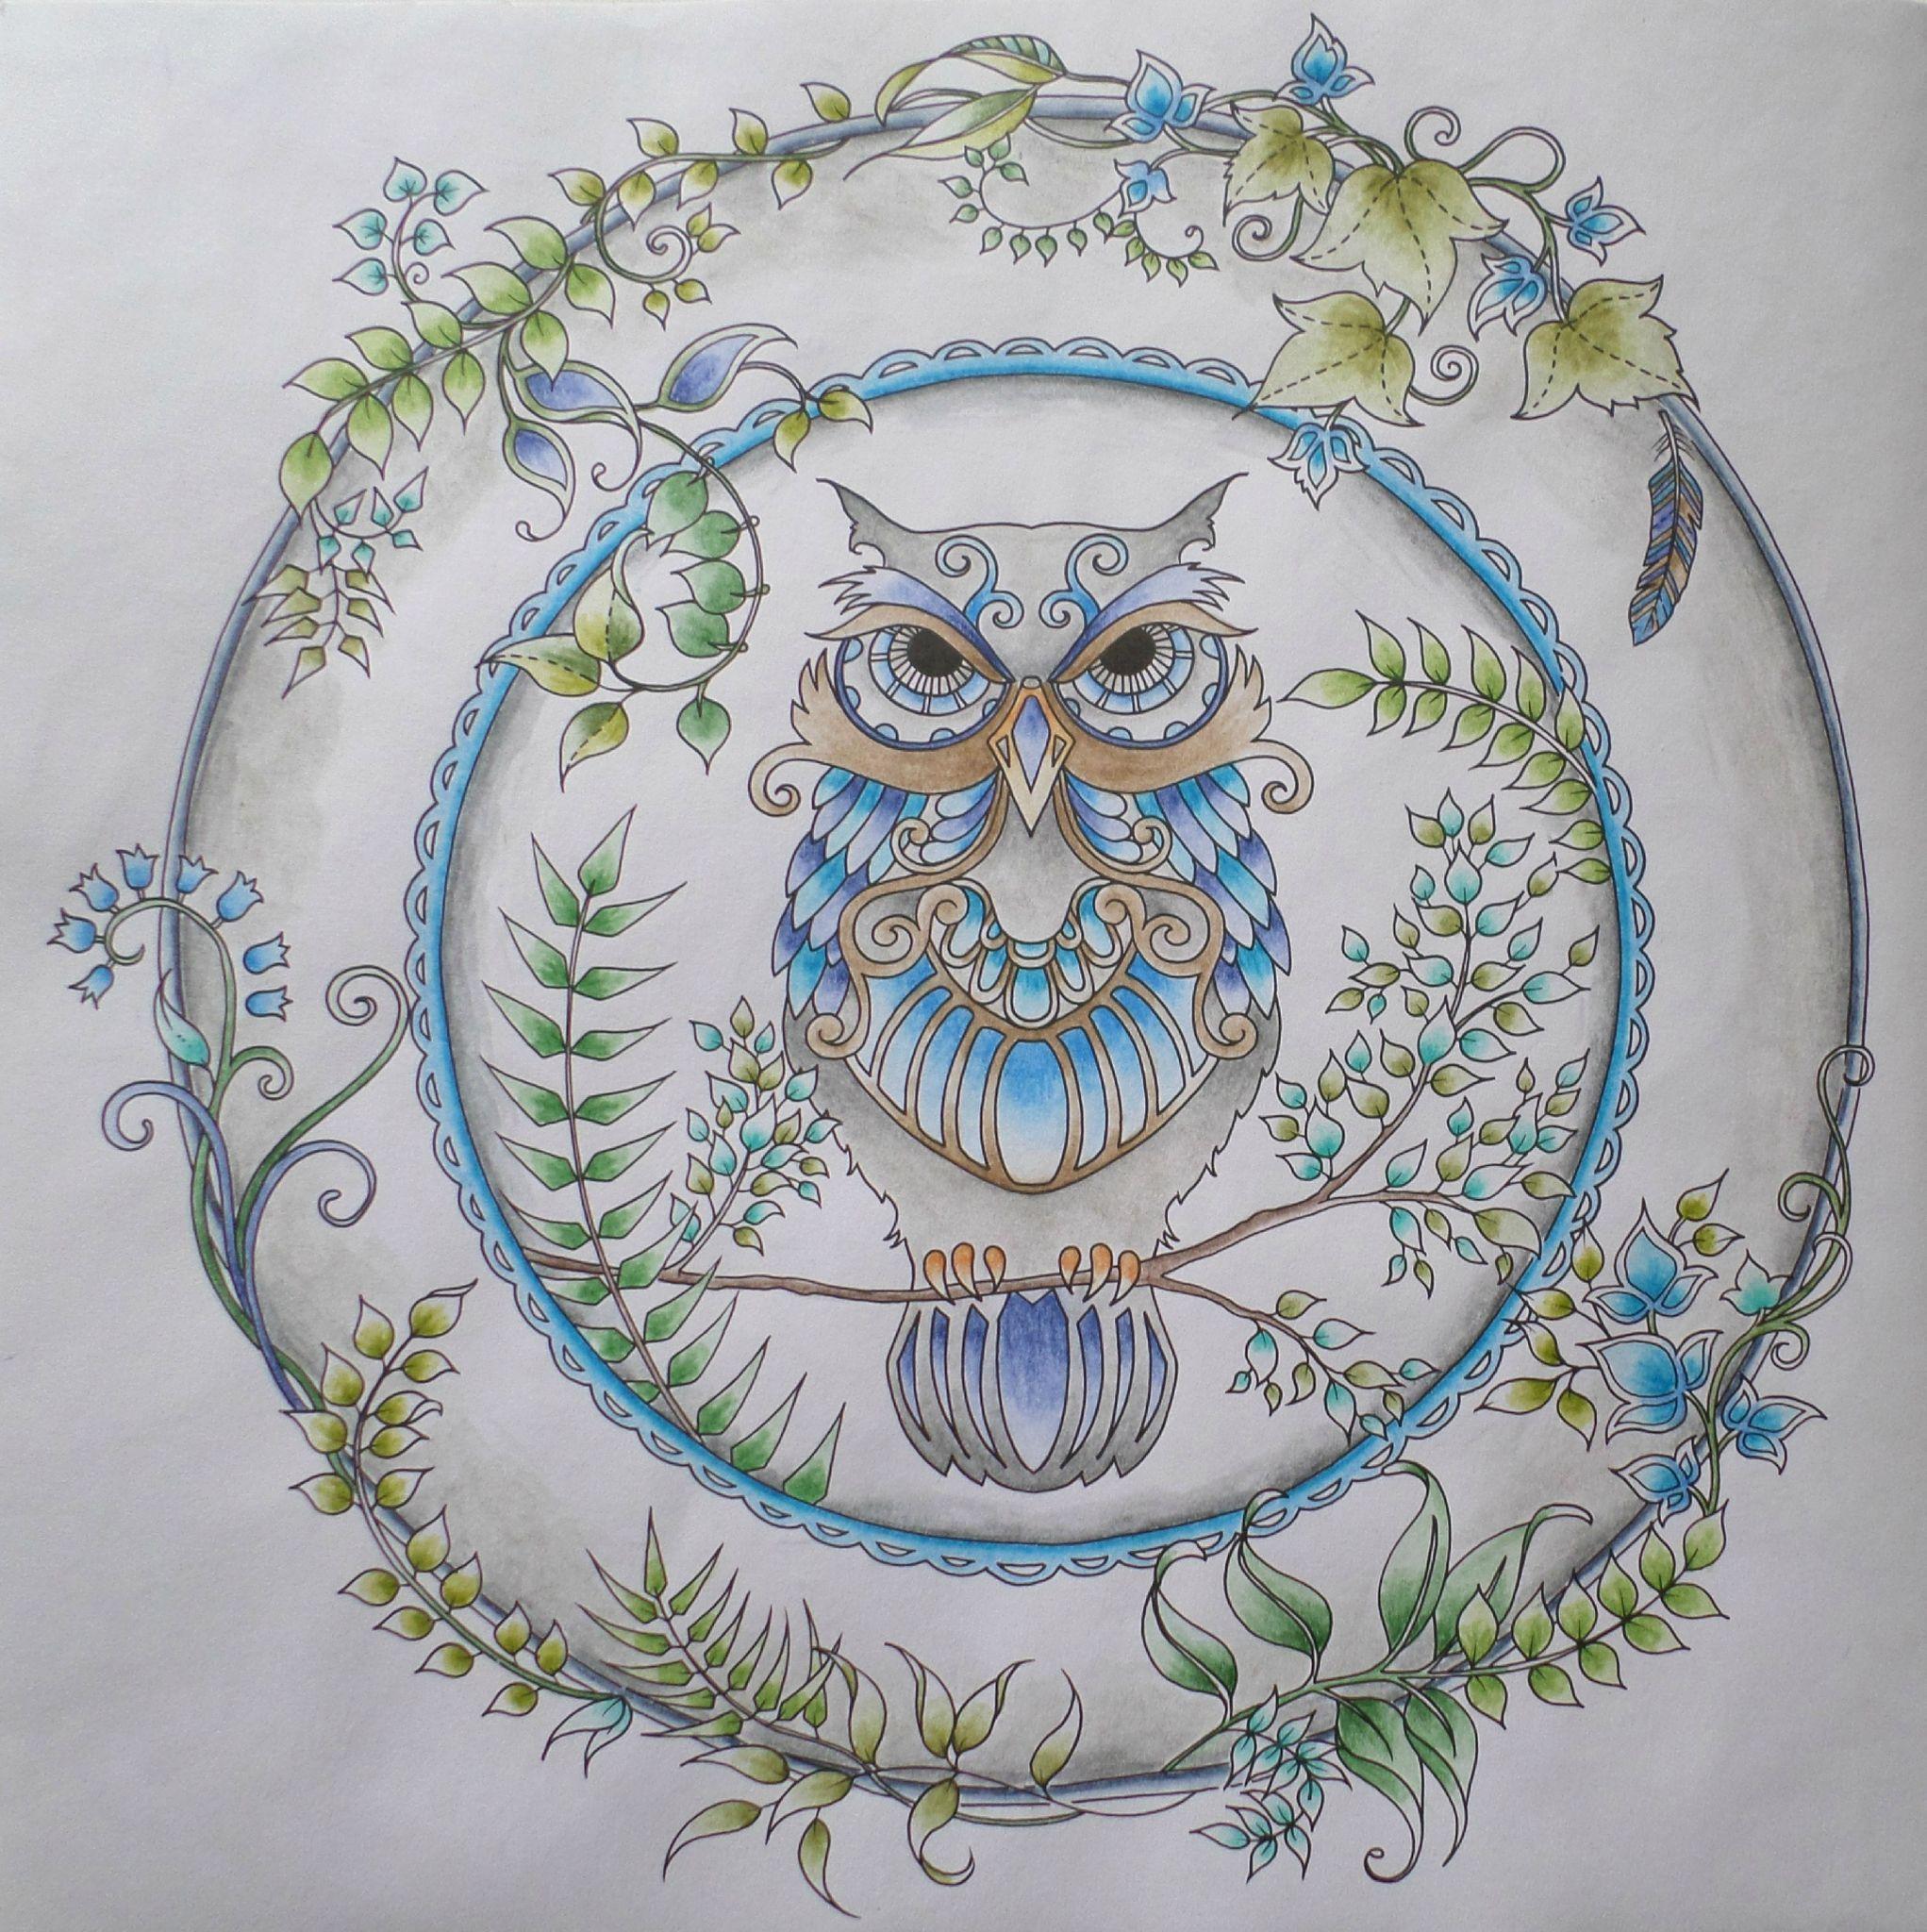 Hibou De La Foret Enchantee Steffy Elsass Crea Coloriage